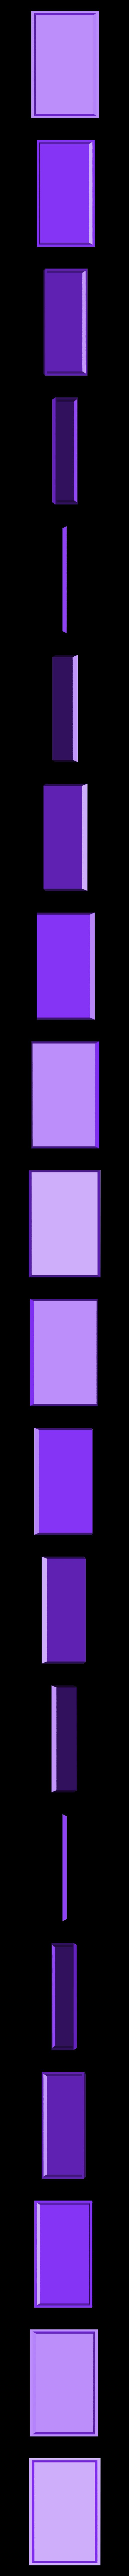 Hollow_GW_style_50mm___75mm_rectangle_for_FDM.stl Download free STL file 75mm * 50mm rectangular Base for wargames Warhammer fantasy battle • 3D printable object, redstarkits